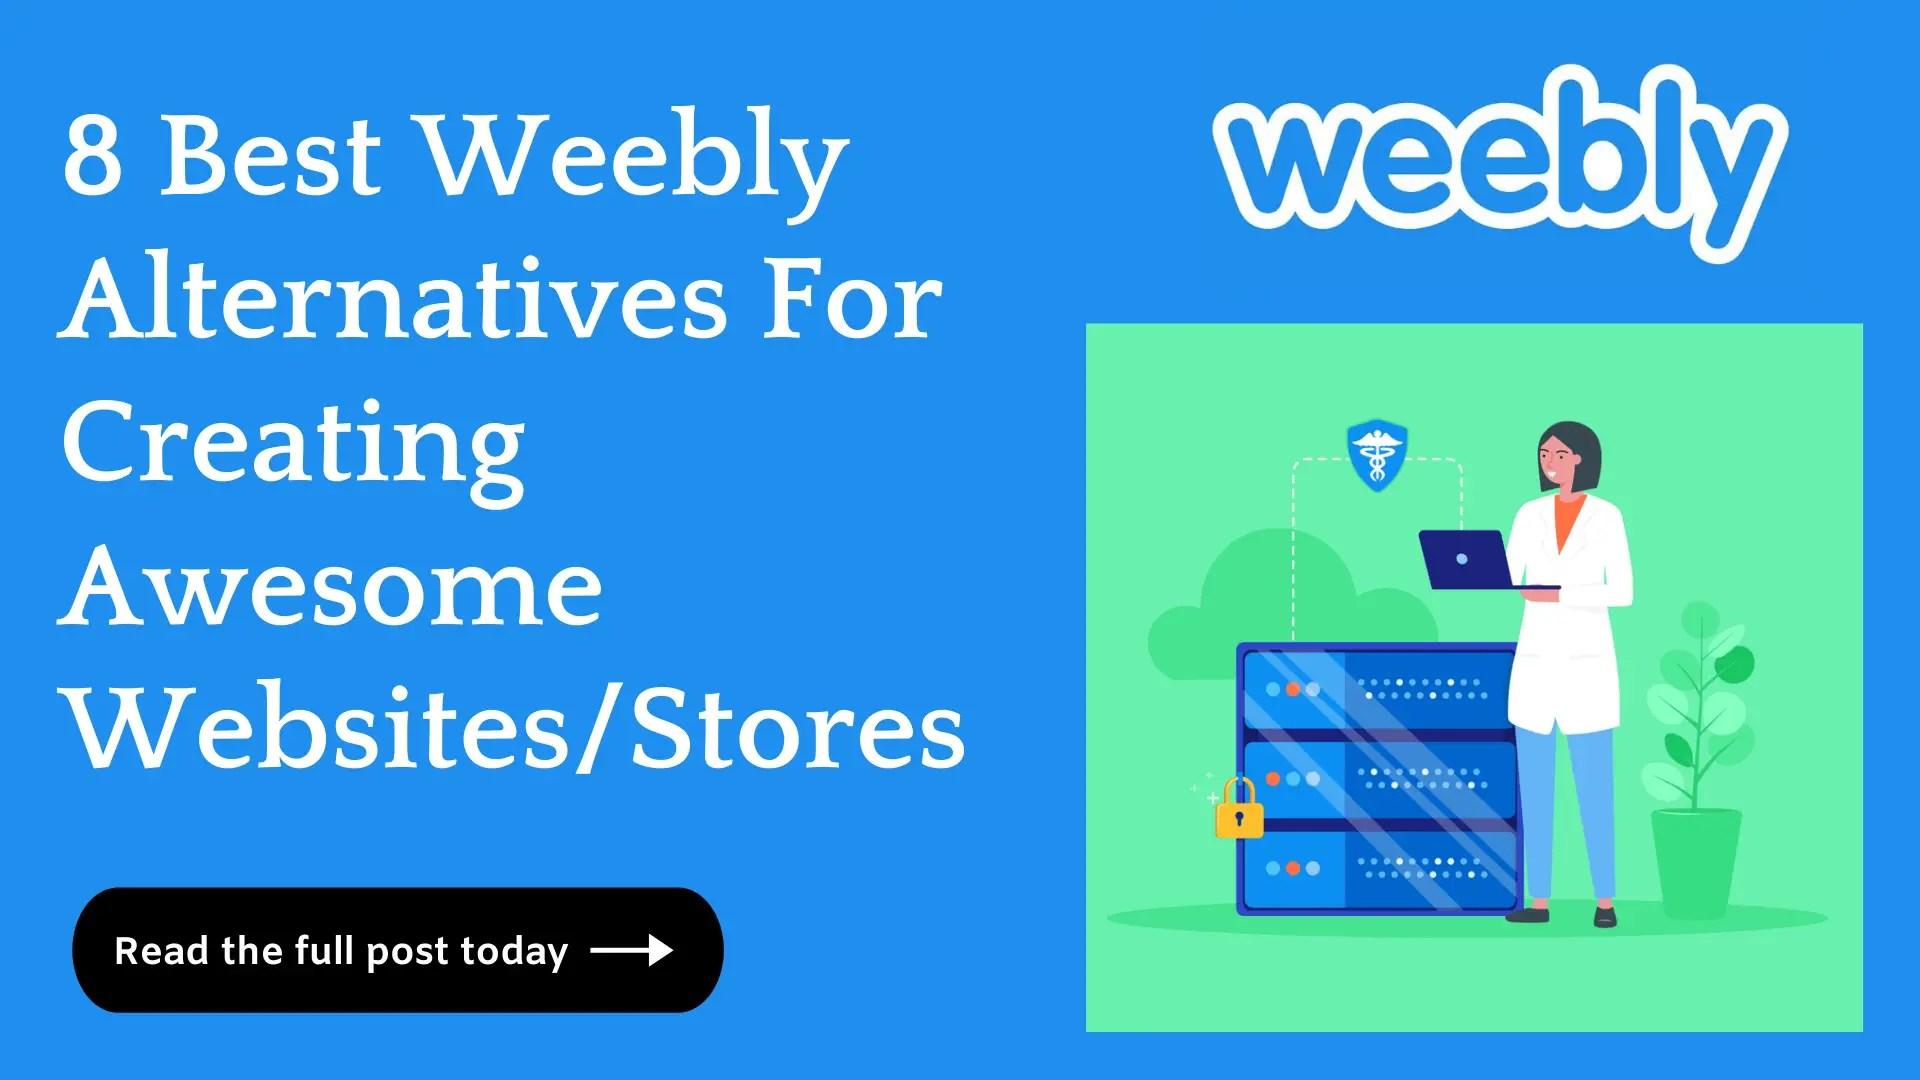 8 Best Weebly Alternatives